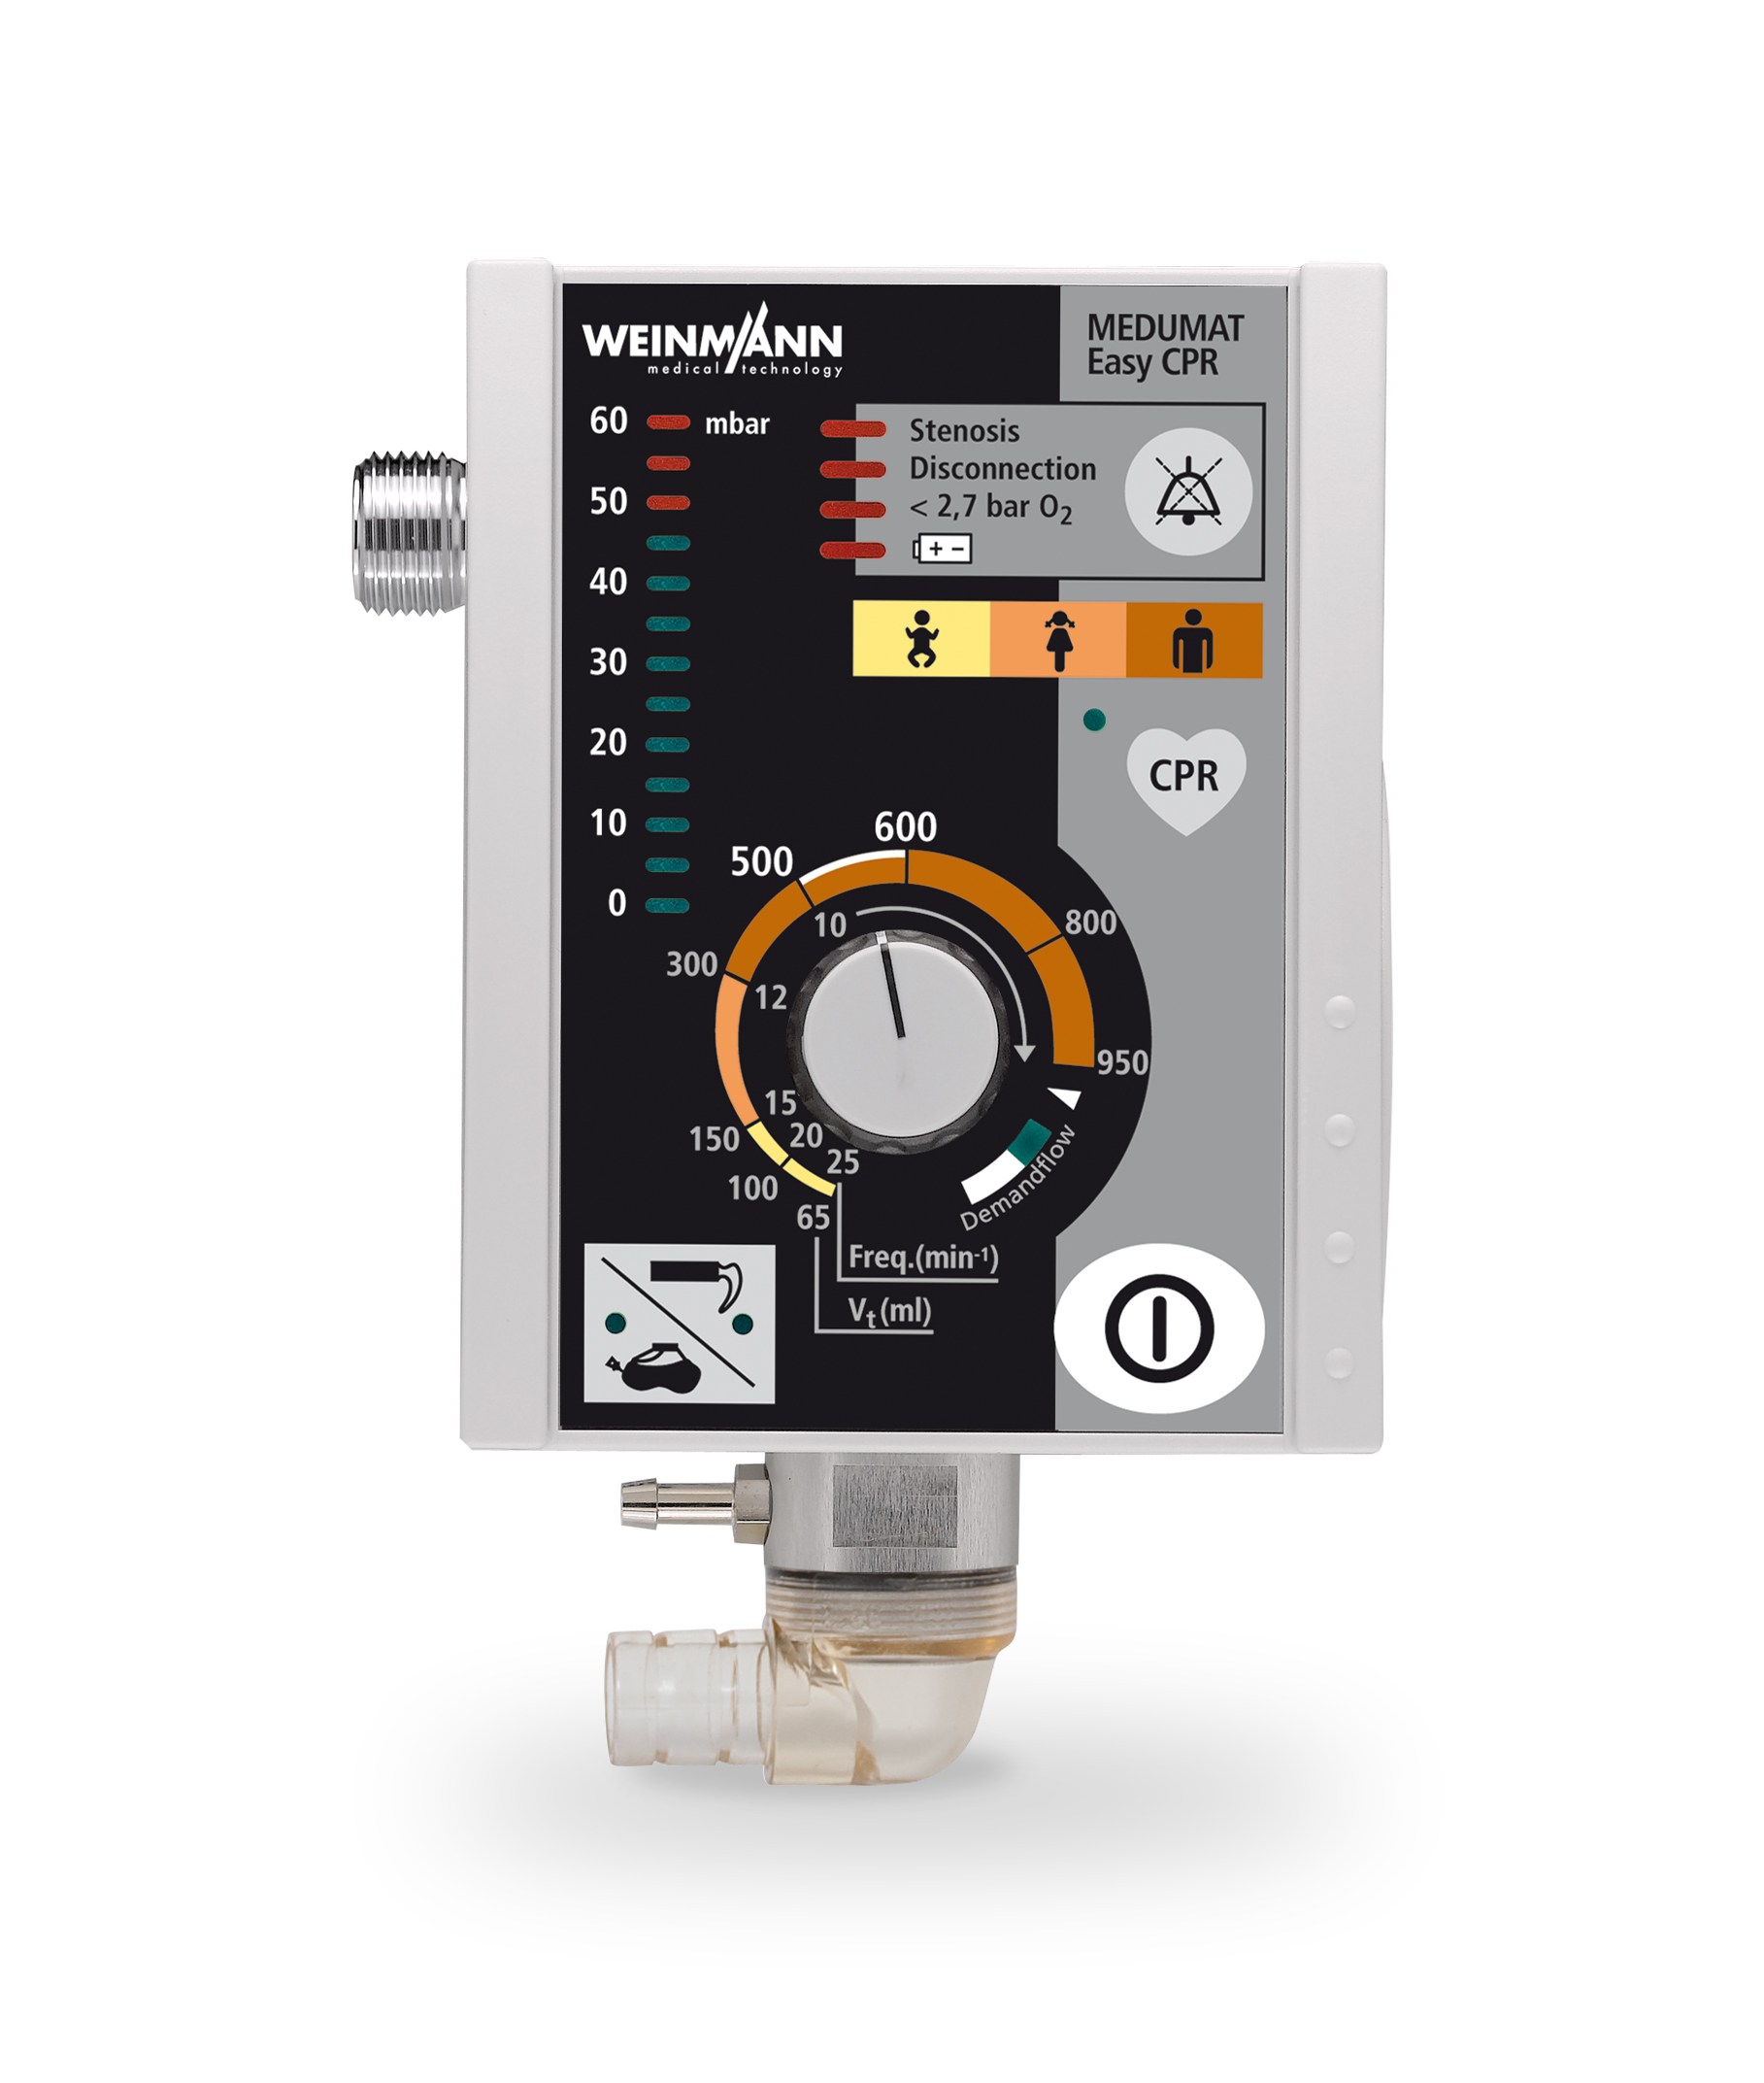 Defibrylator Meducore Standard Pro + Respirator Medumat Easy CPR na Life-Base 1 NG XL